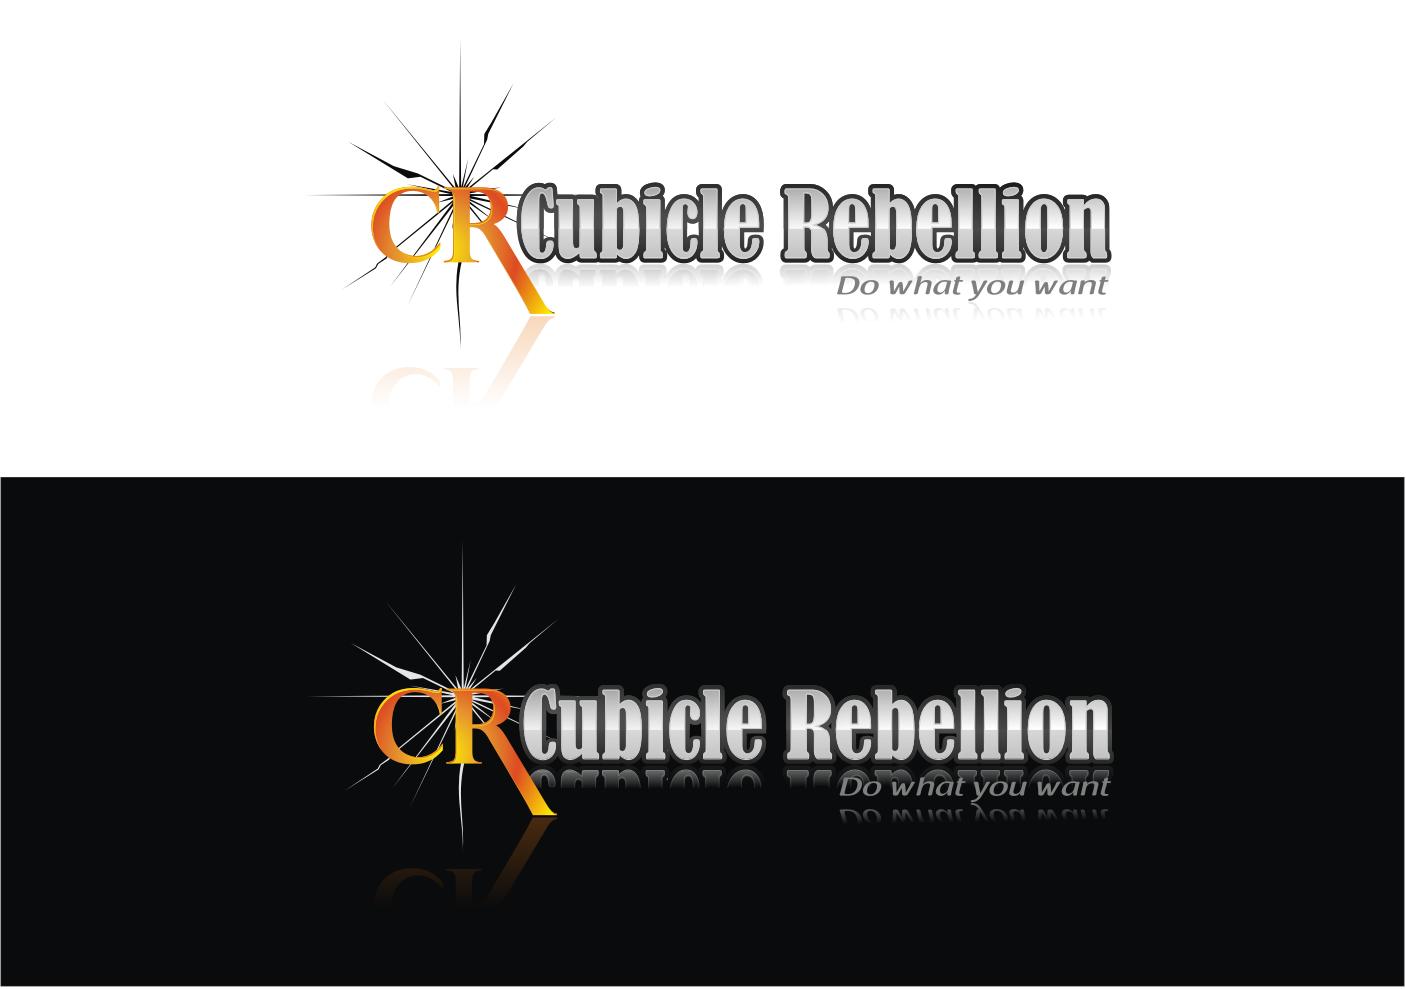 Cubicle Rebellion: Edgy, but elegant, anti-corporate logo needed